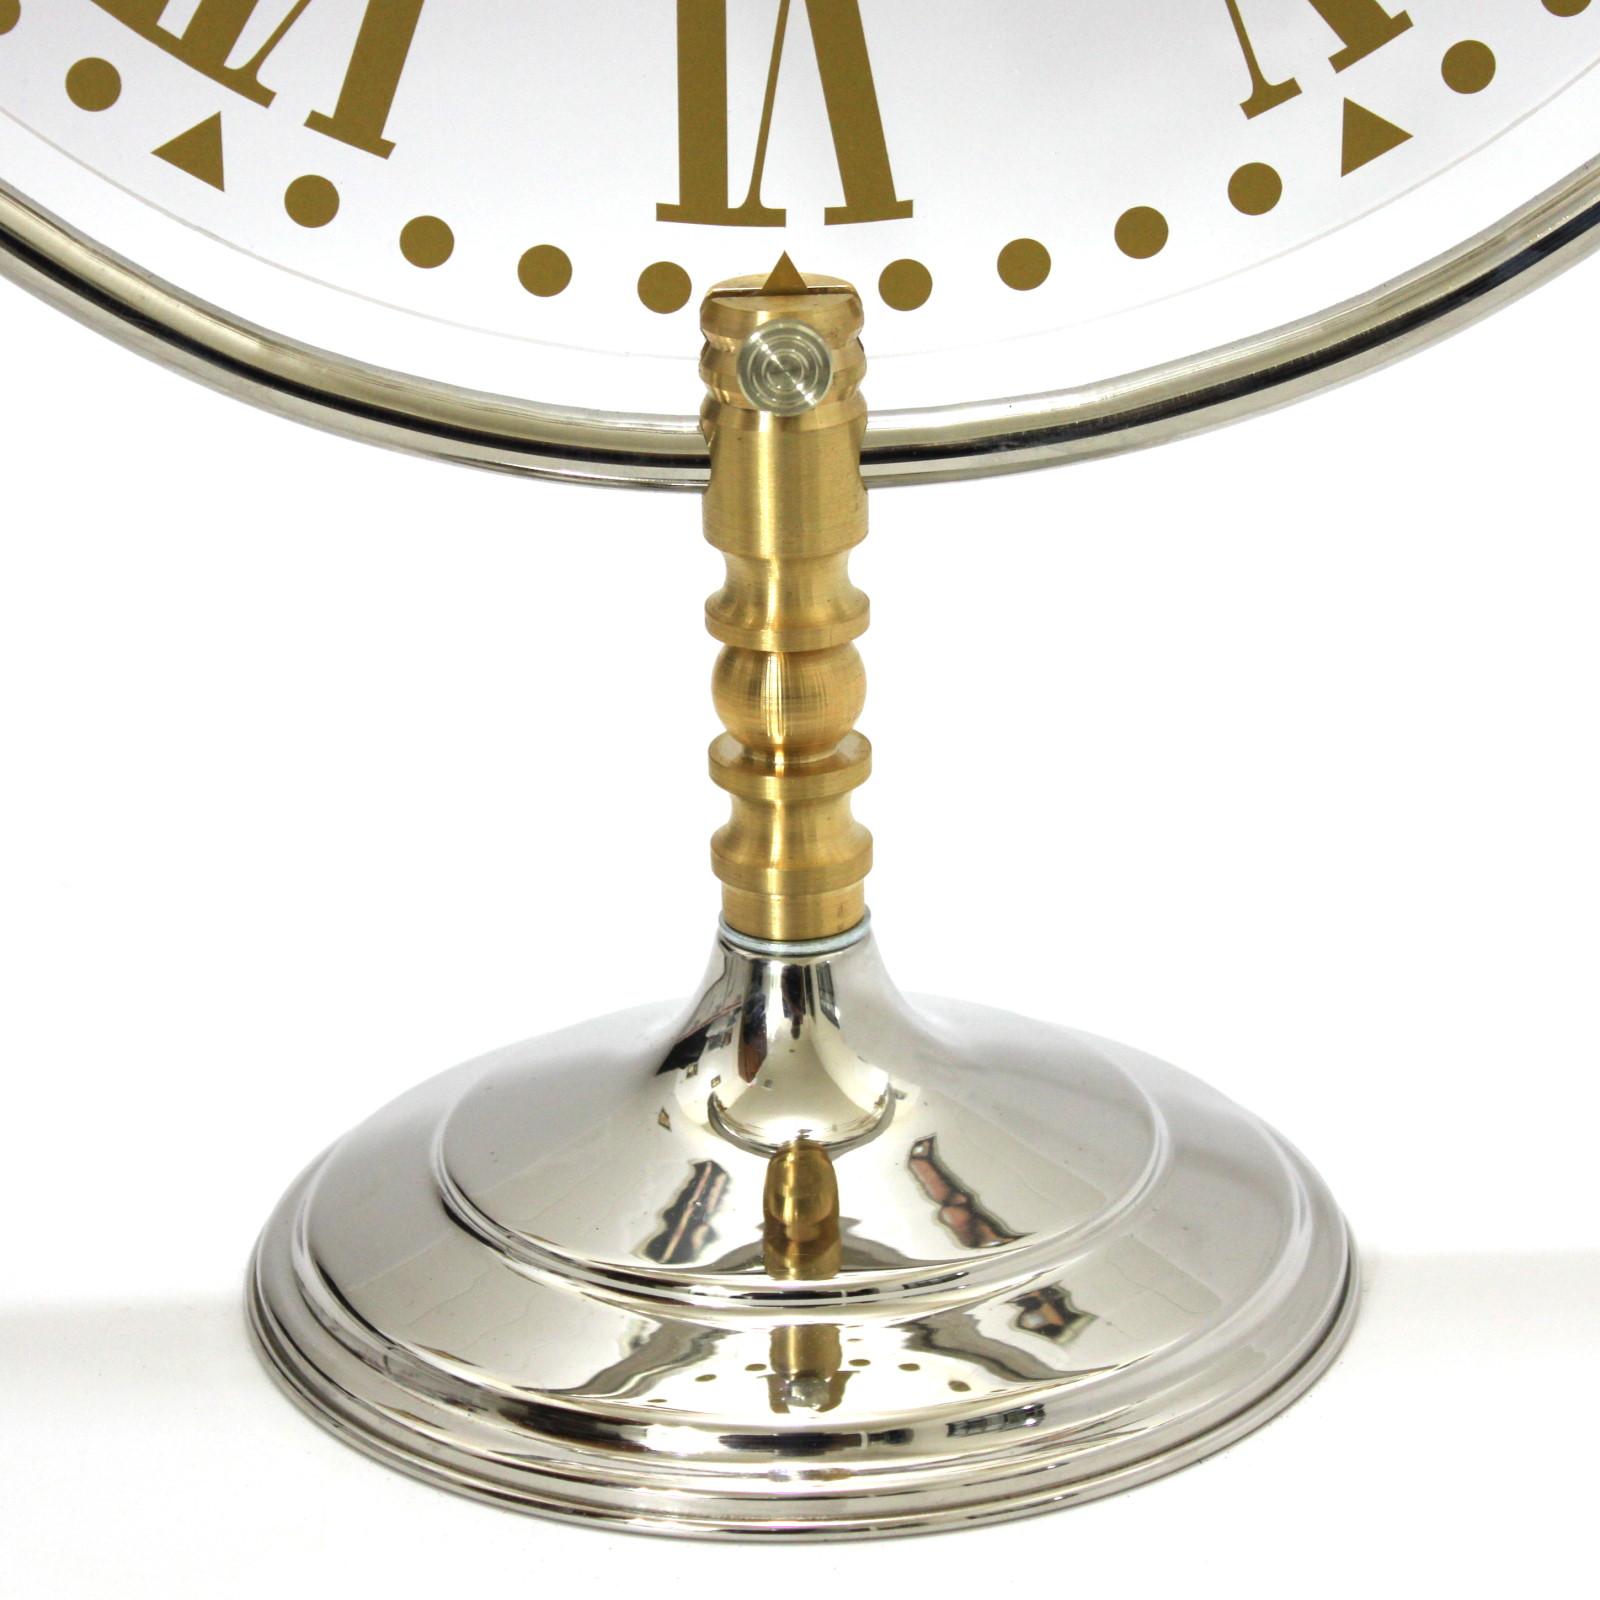 European Spirit Clock Dial by Gard Modern Magic Studio